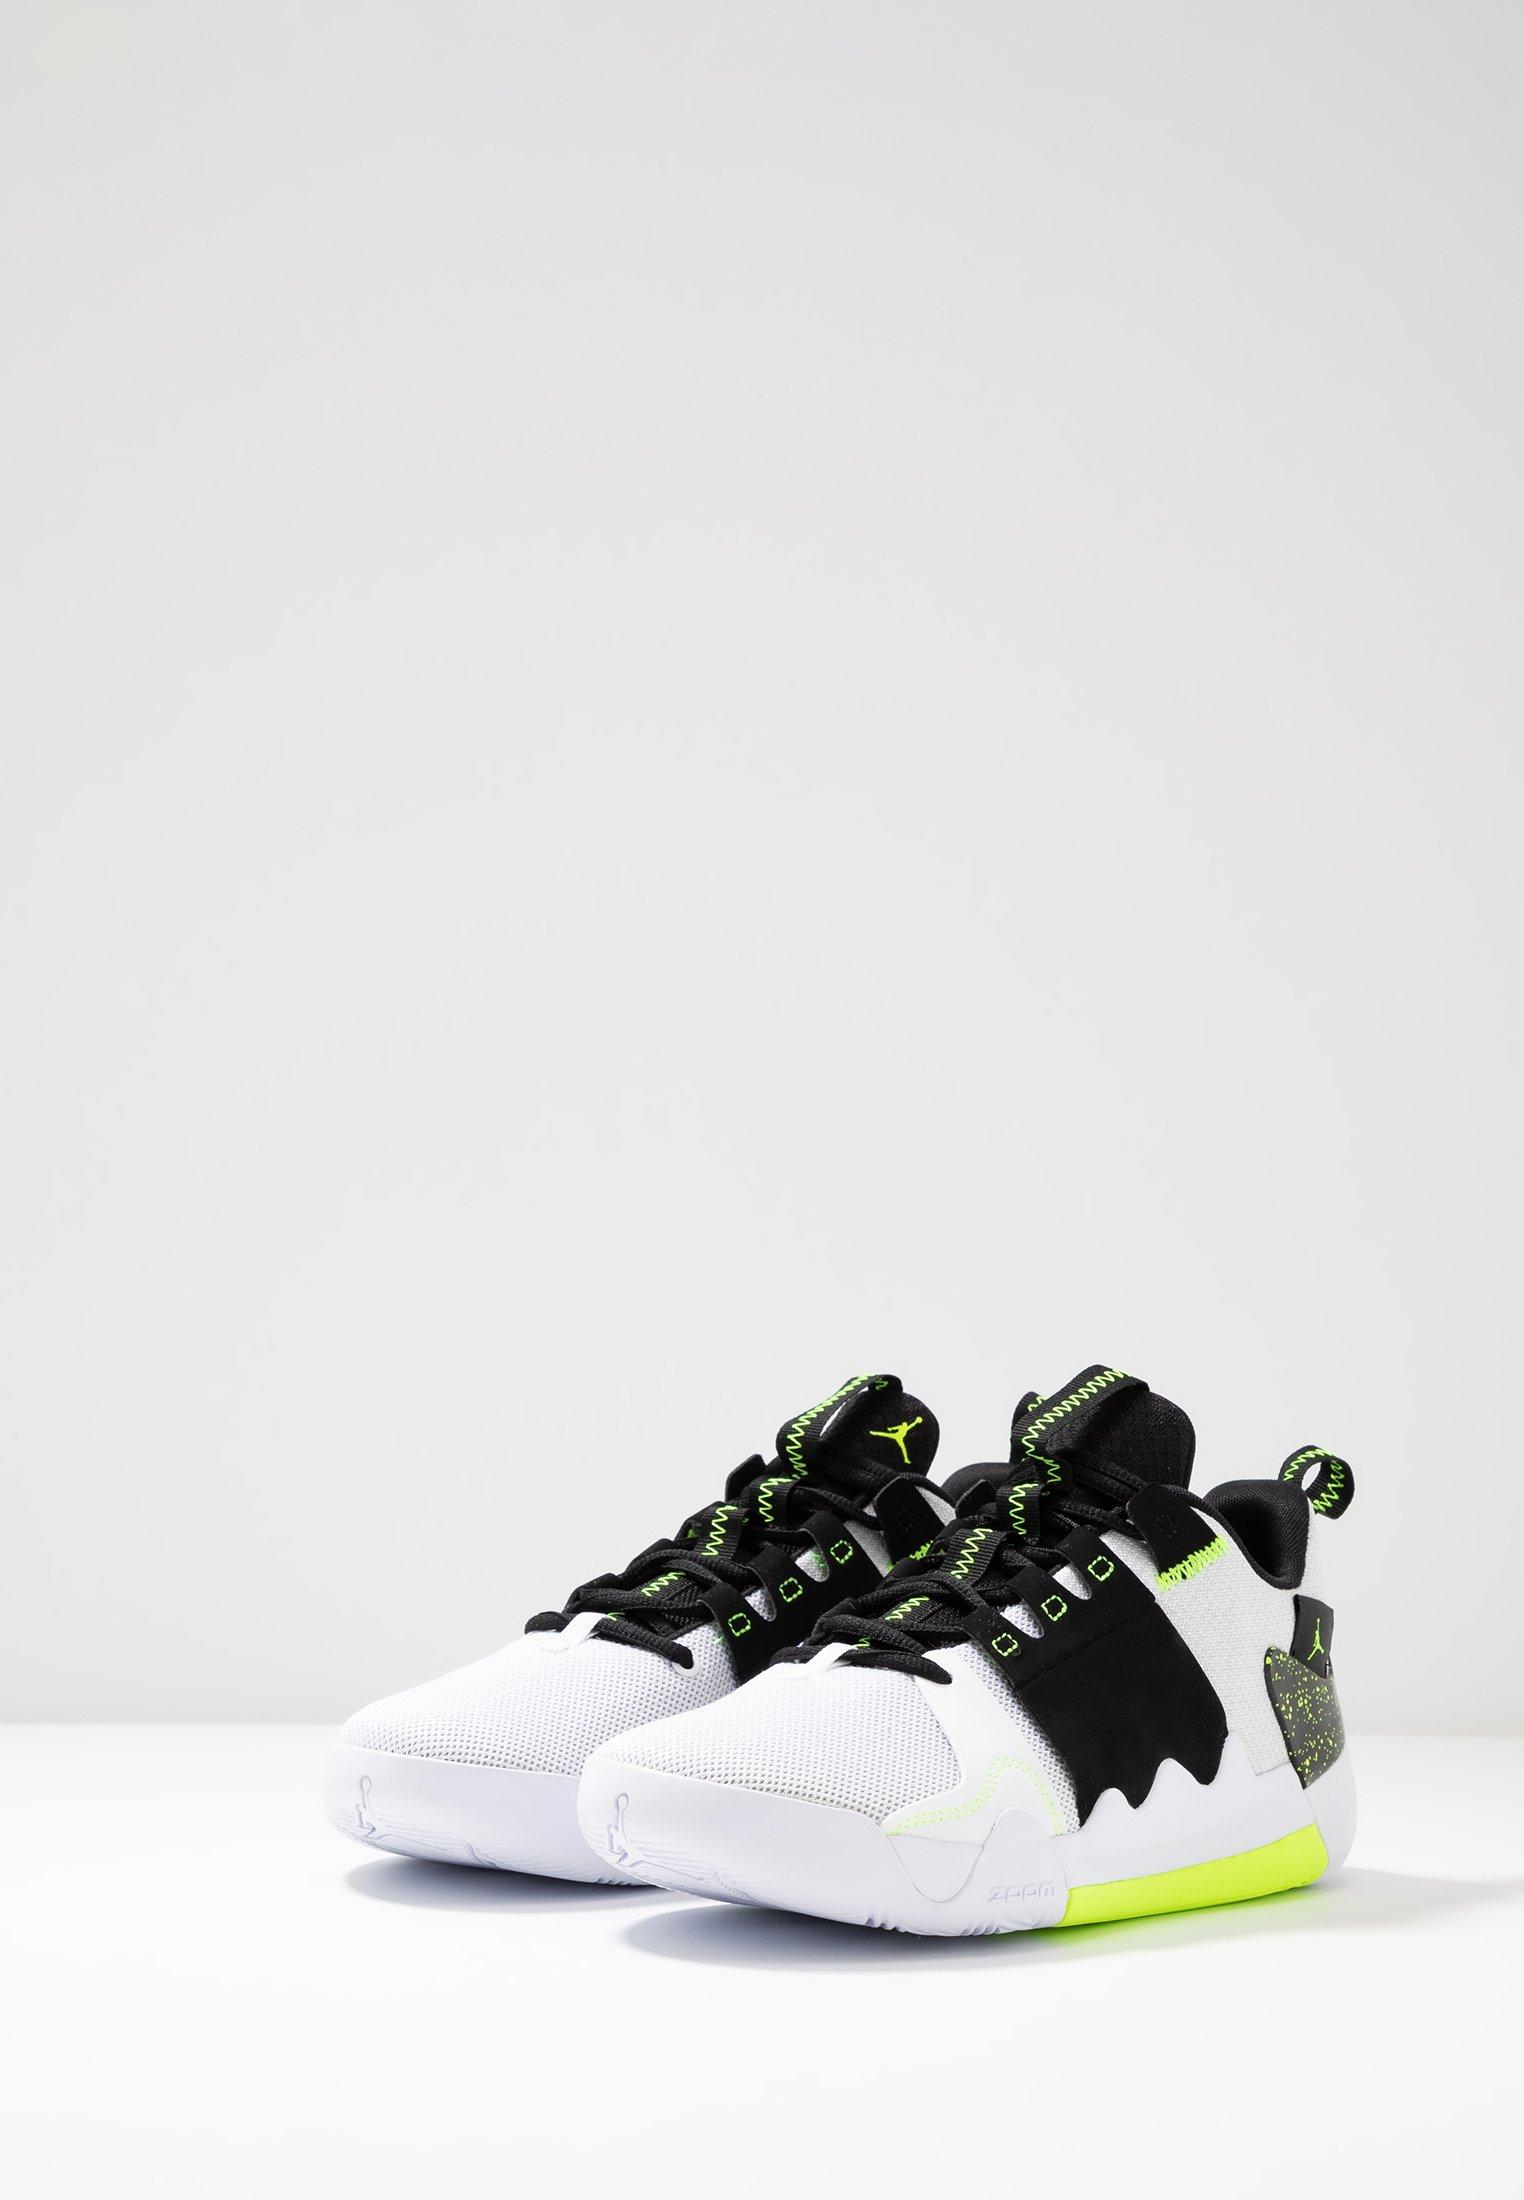 Jordan Basketballschuh - white/volt/black/weiß - Herrenschuhe 0pwn5